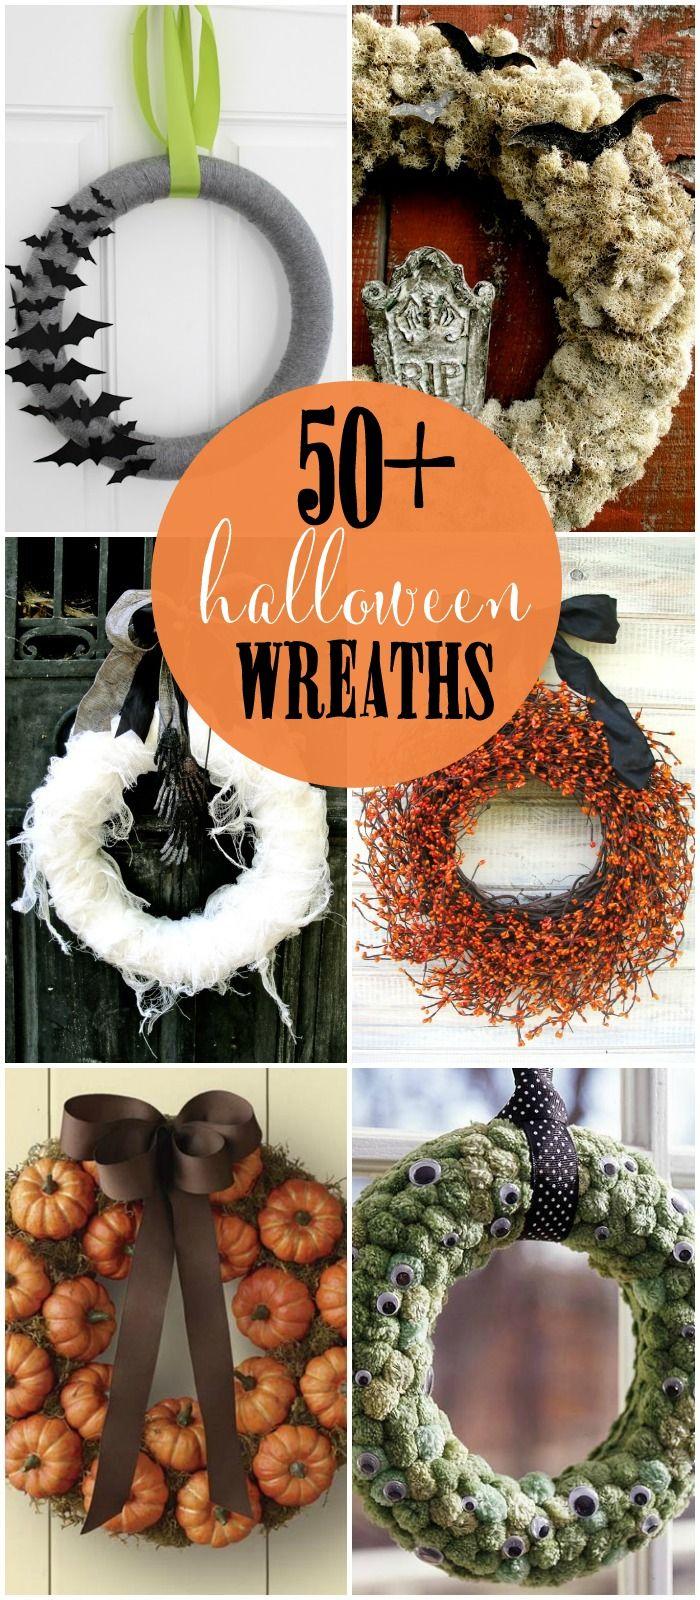 50+ DIY Halloween Wreaths - so many great ideas! { lilluna.com } #halloween